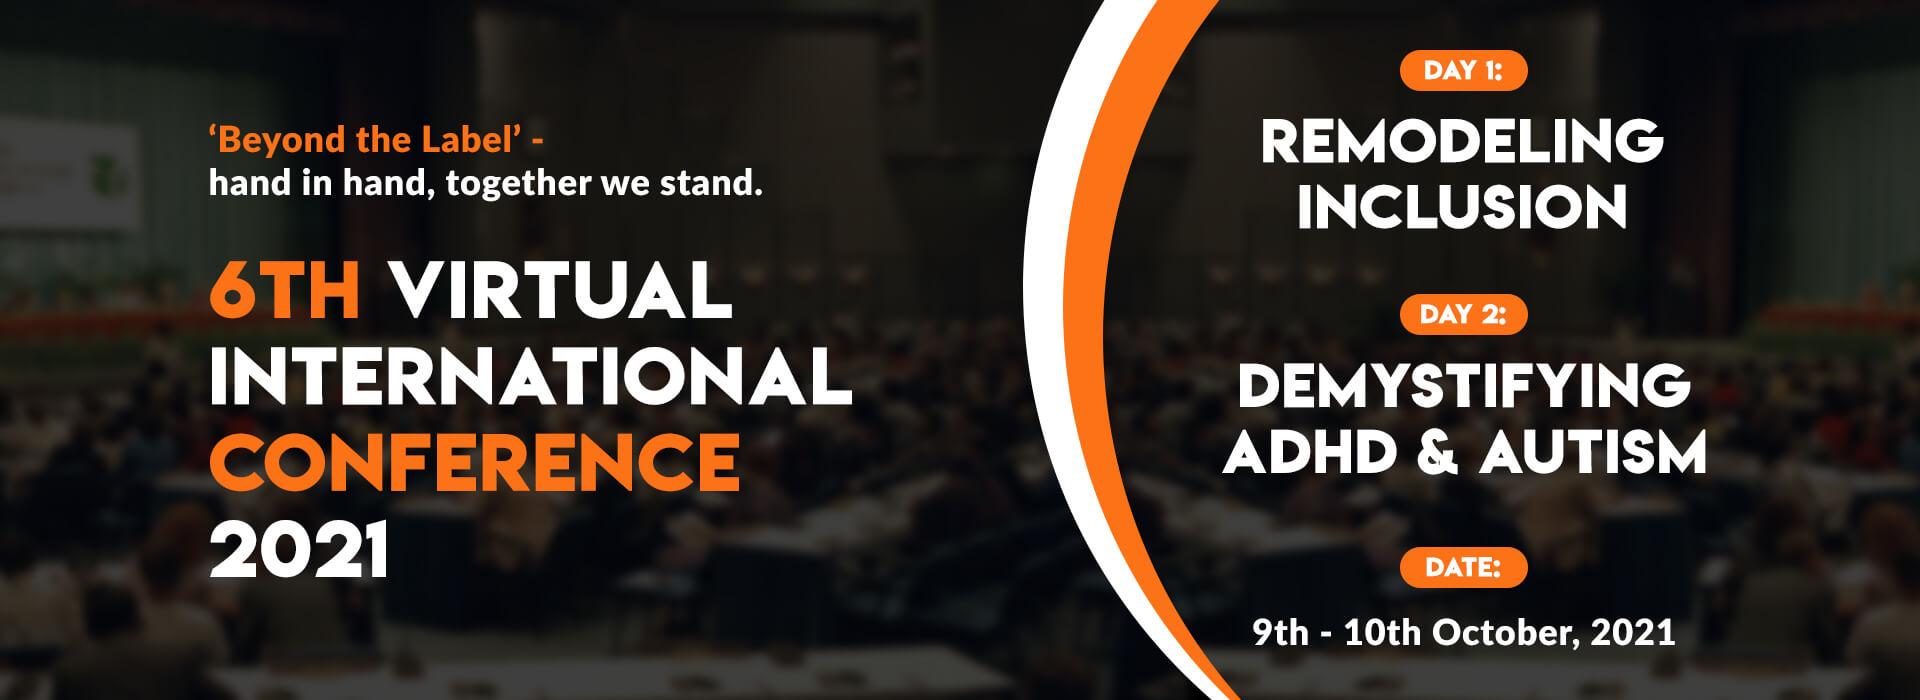 6th Virtual International Conference 2021